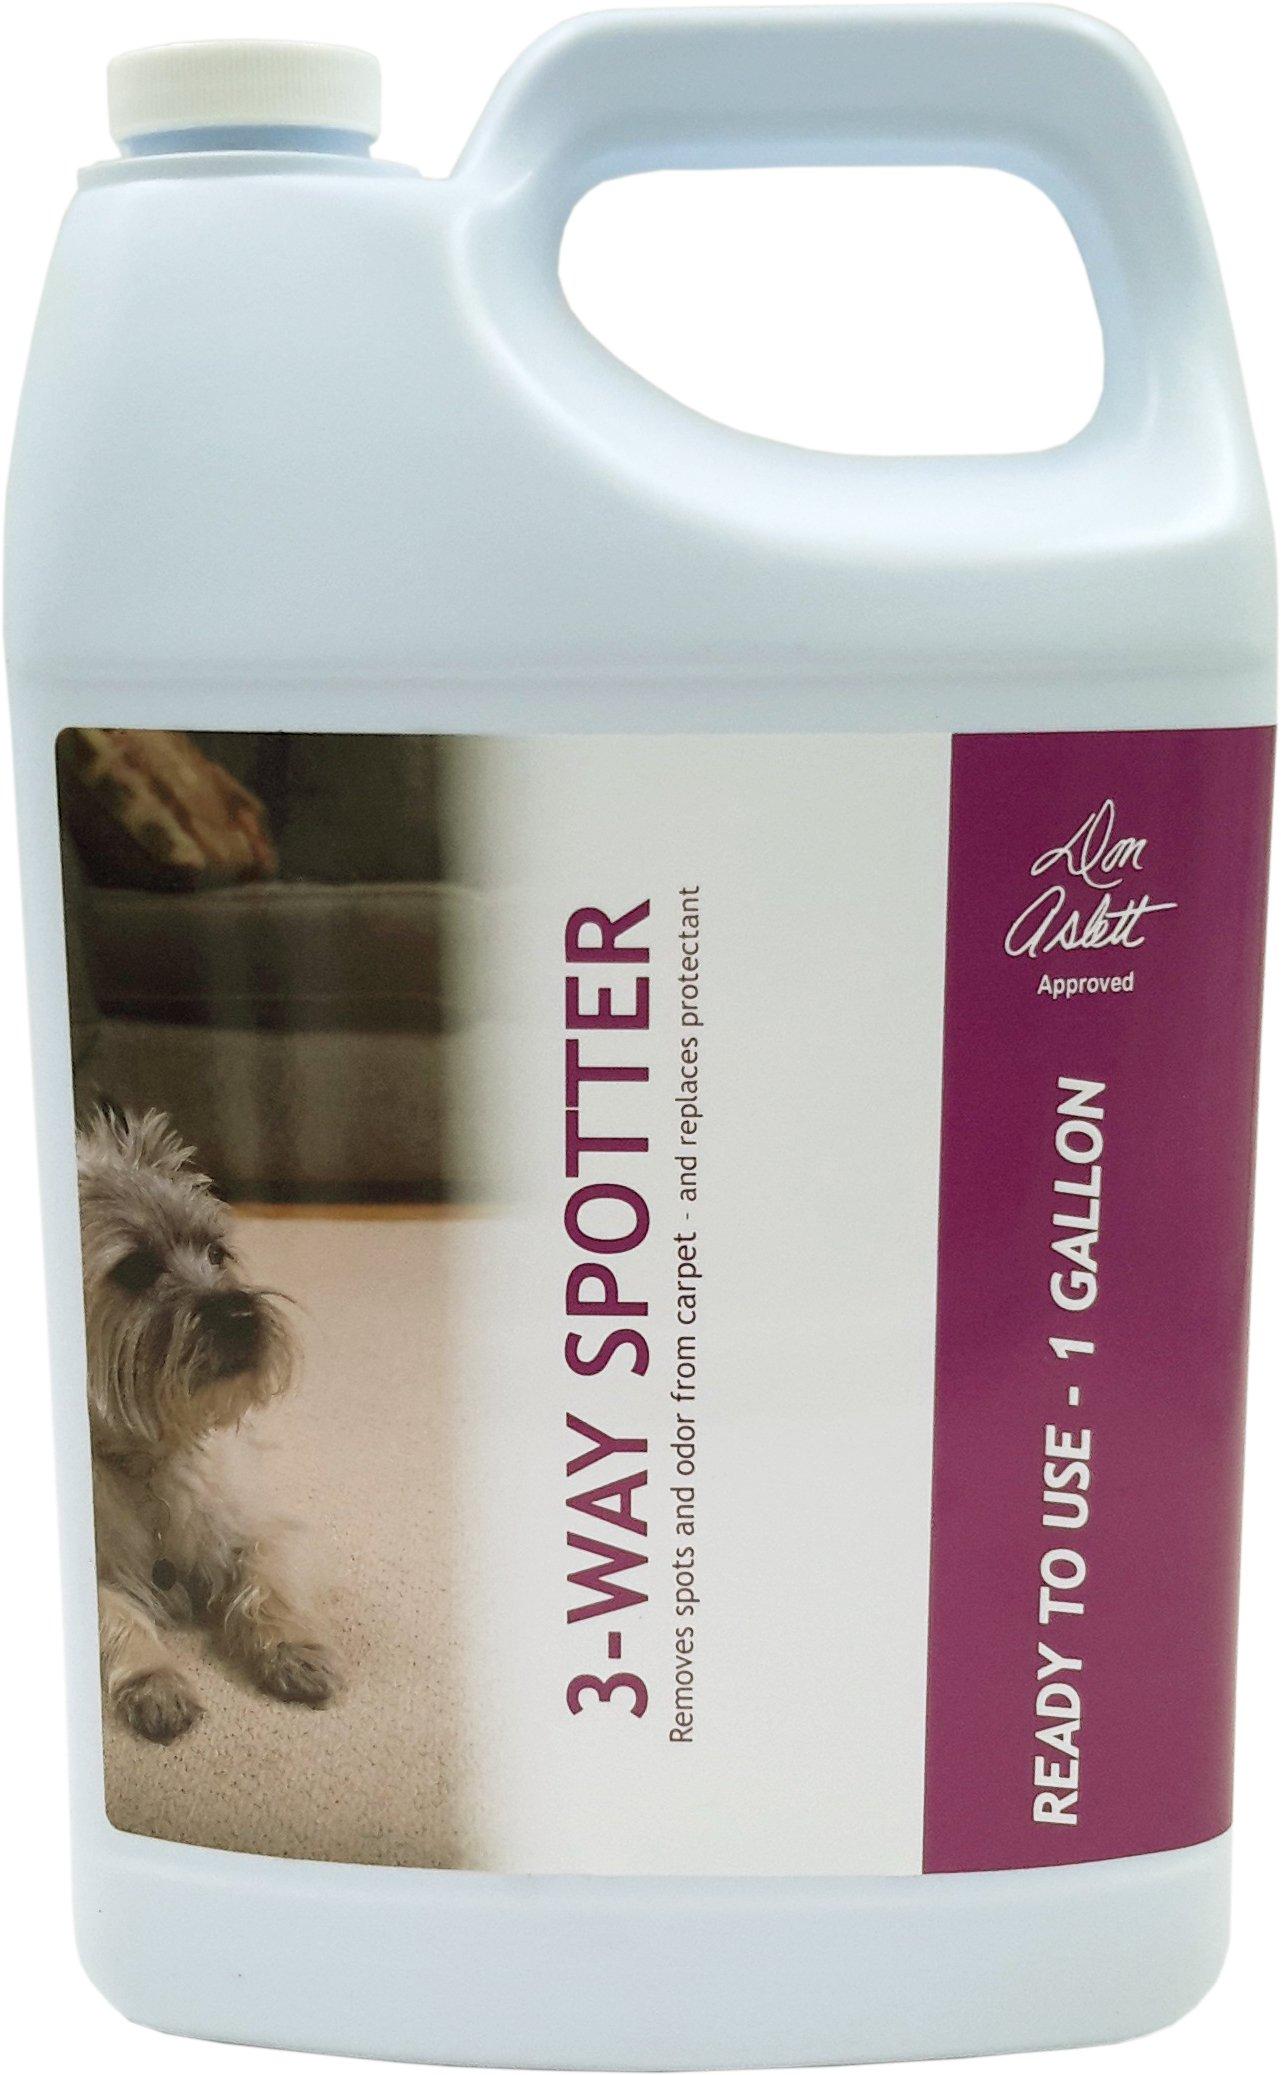 Don Aslett's 3-Way Spotter-Gallon